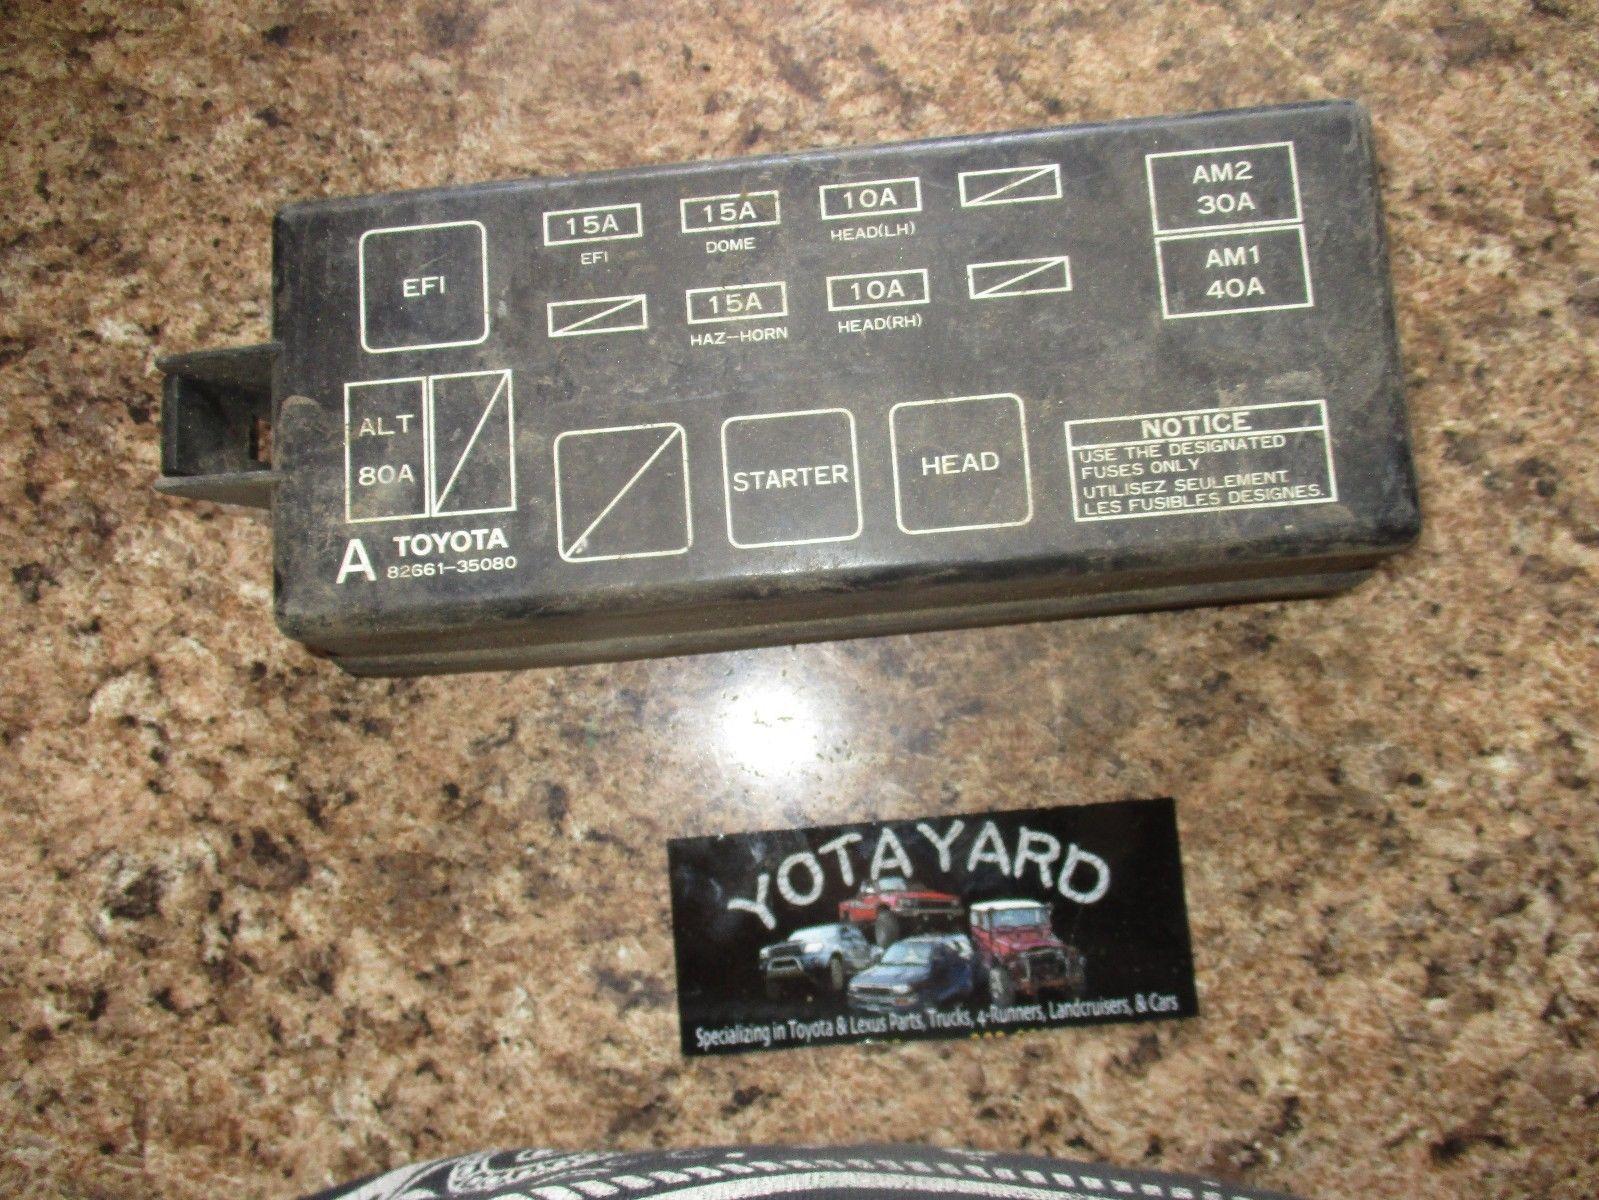 2003 4runner Fuse Lid Wiring Diagram 2004 Toyota Box 90 95 Pickup And 50 Similar Items Rh Bonanza Com 2000